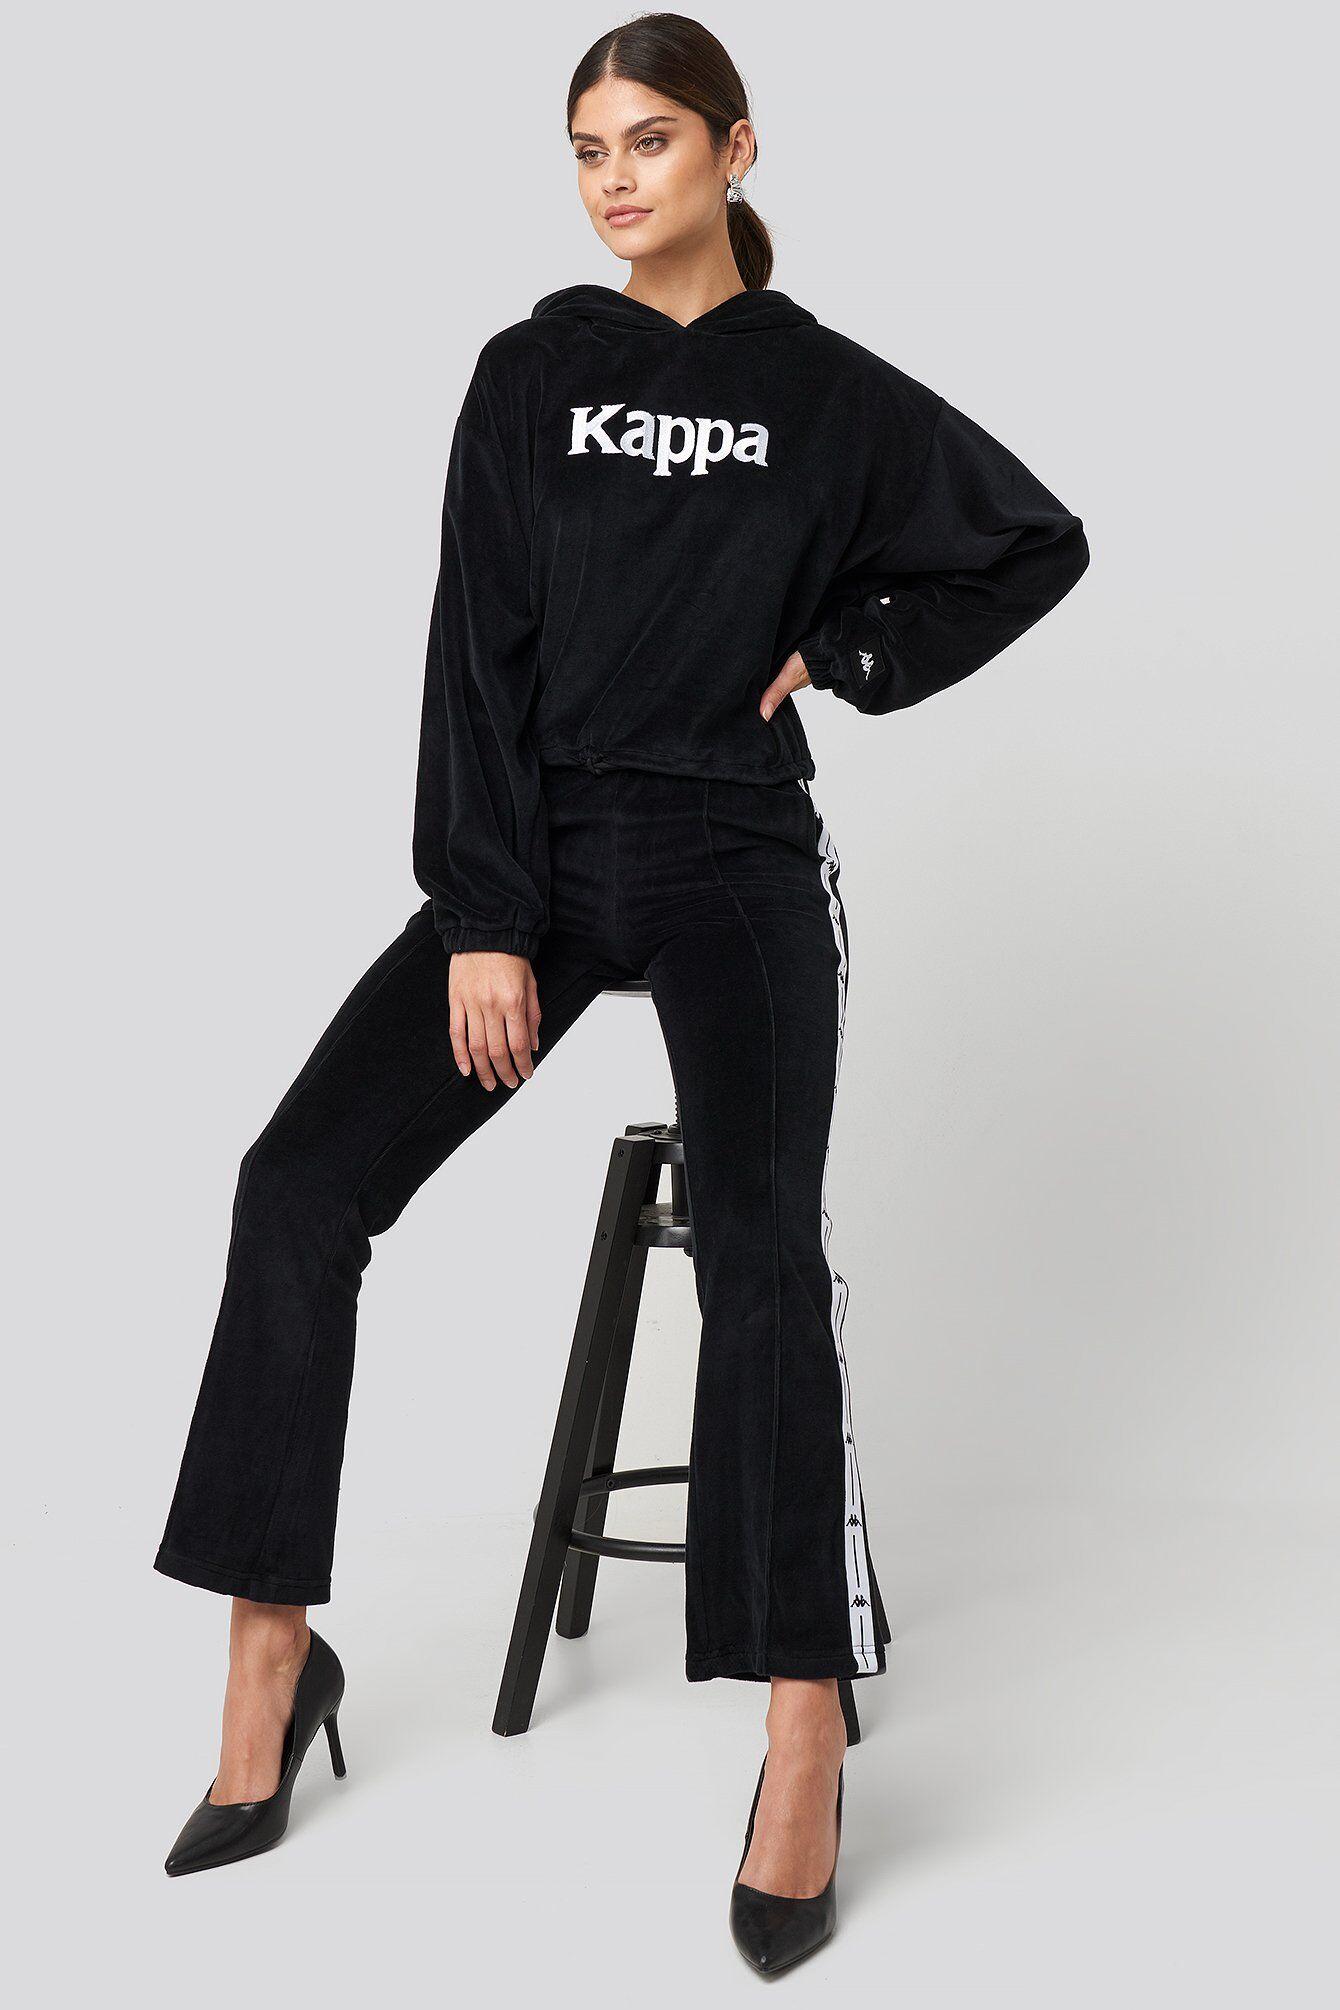 Kappa Barav Pants - Black  - Size: Small